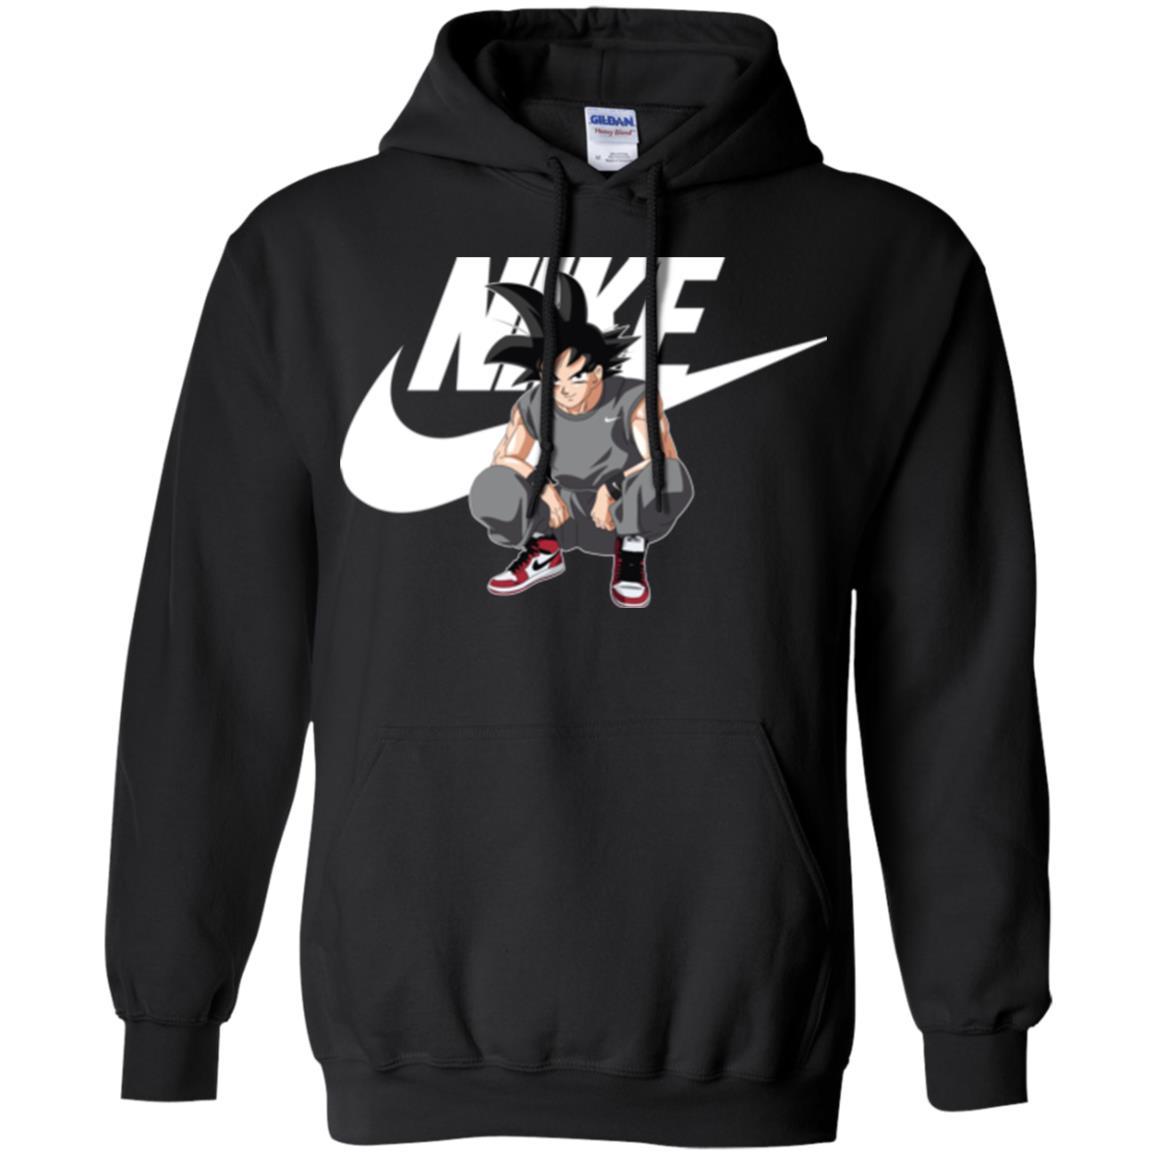 image 254px Songoku Nike Mashup T Shirt, Hoodies, Tank Top